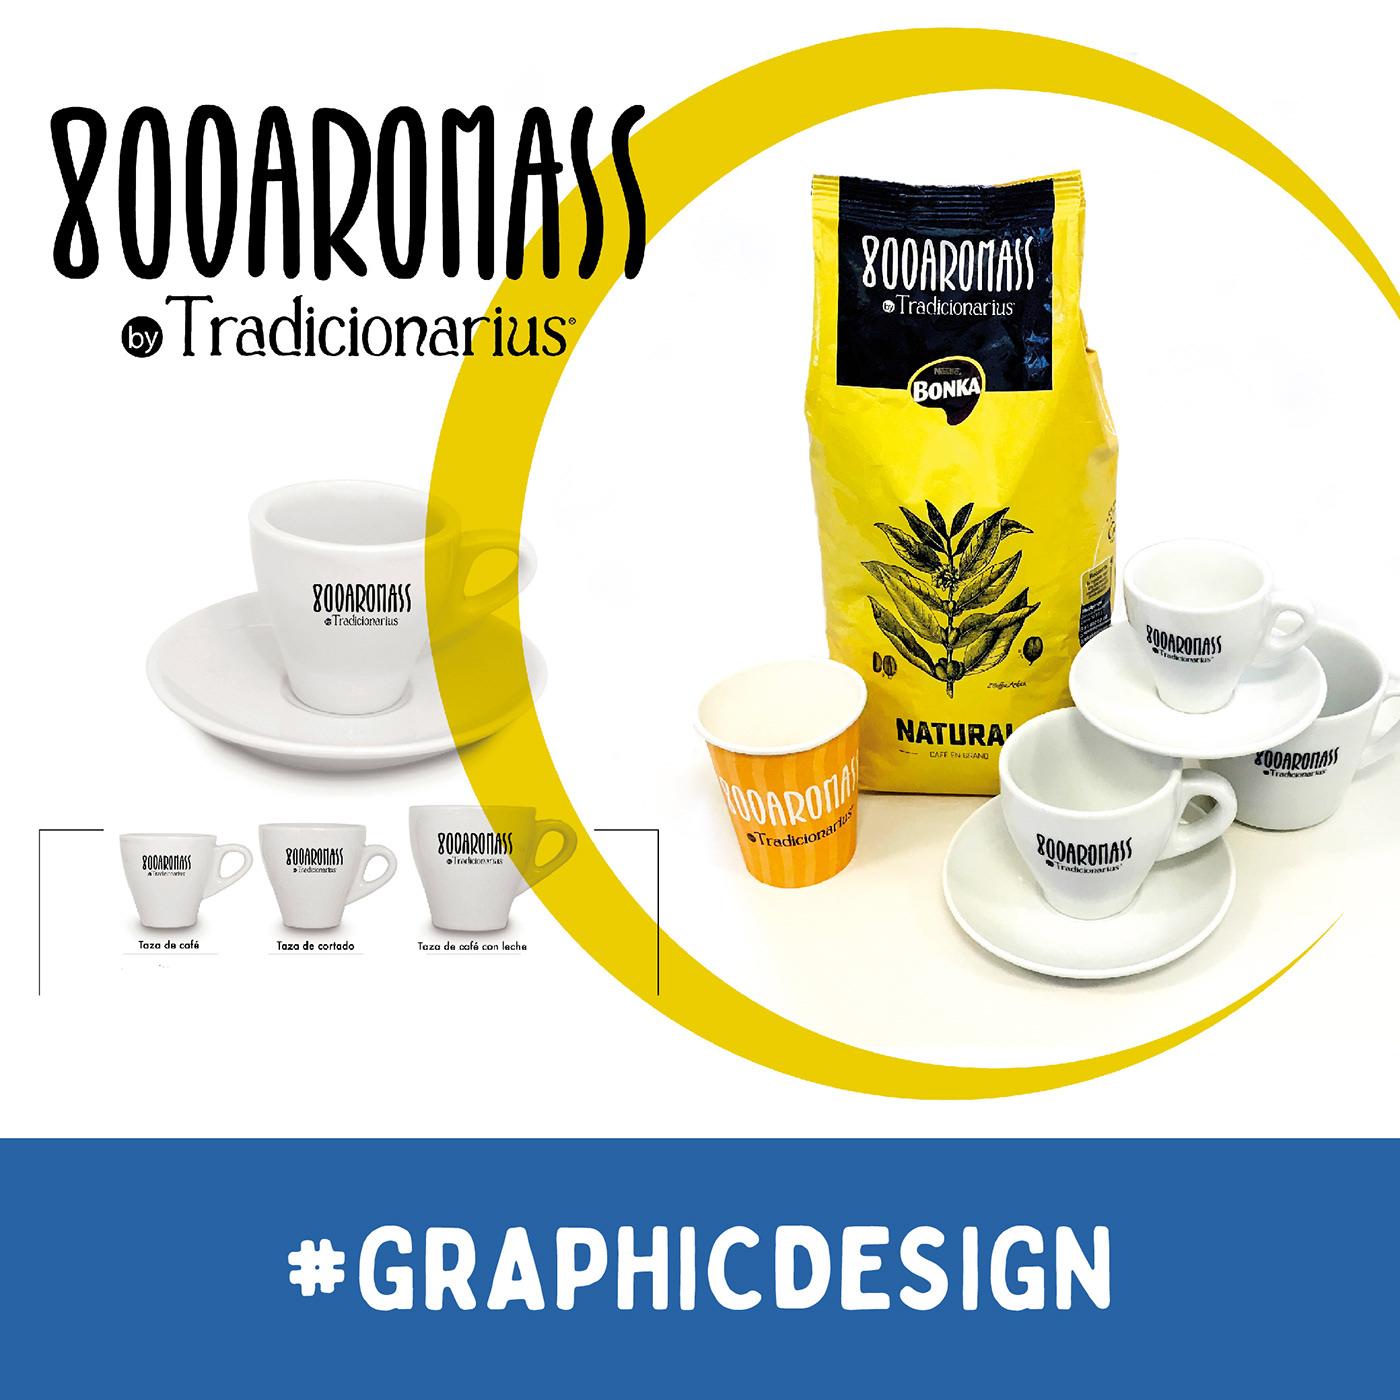 "Naming & Product ""800AROMASS"". Cobranding Bonka (Nestlé) / Tradicionarius"